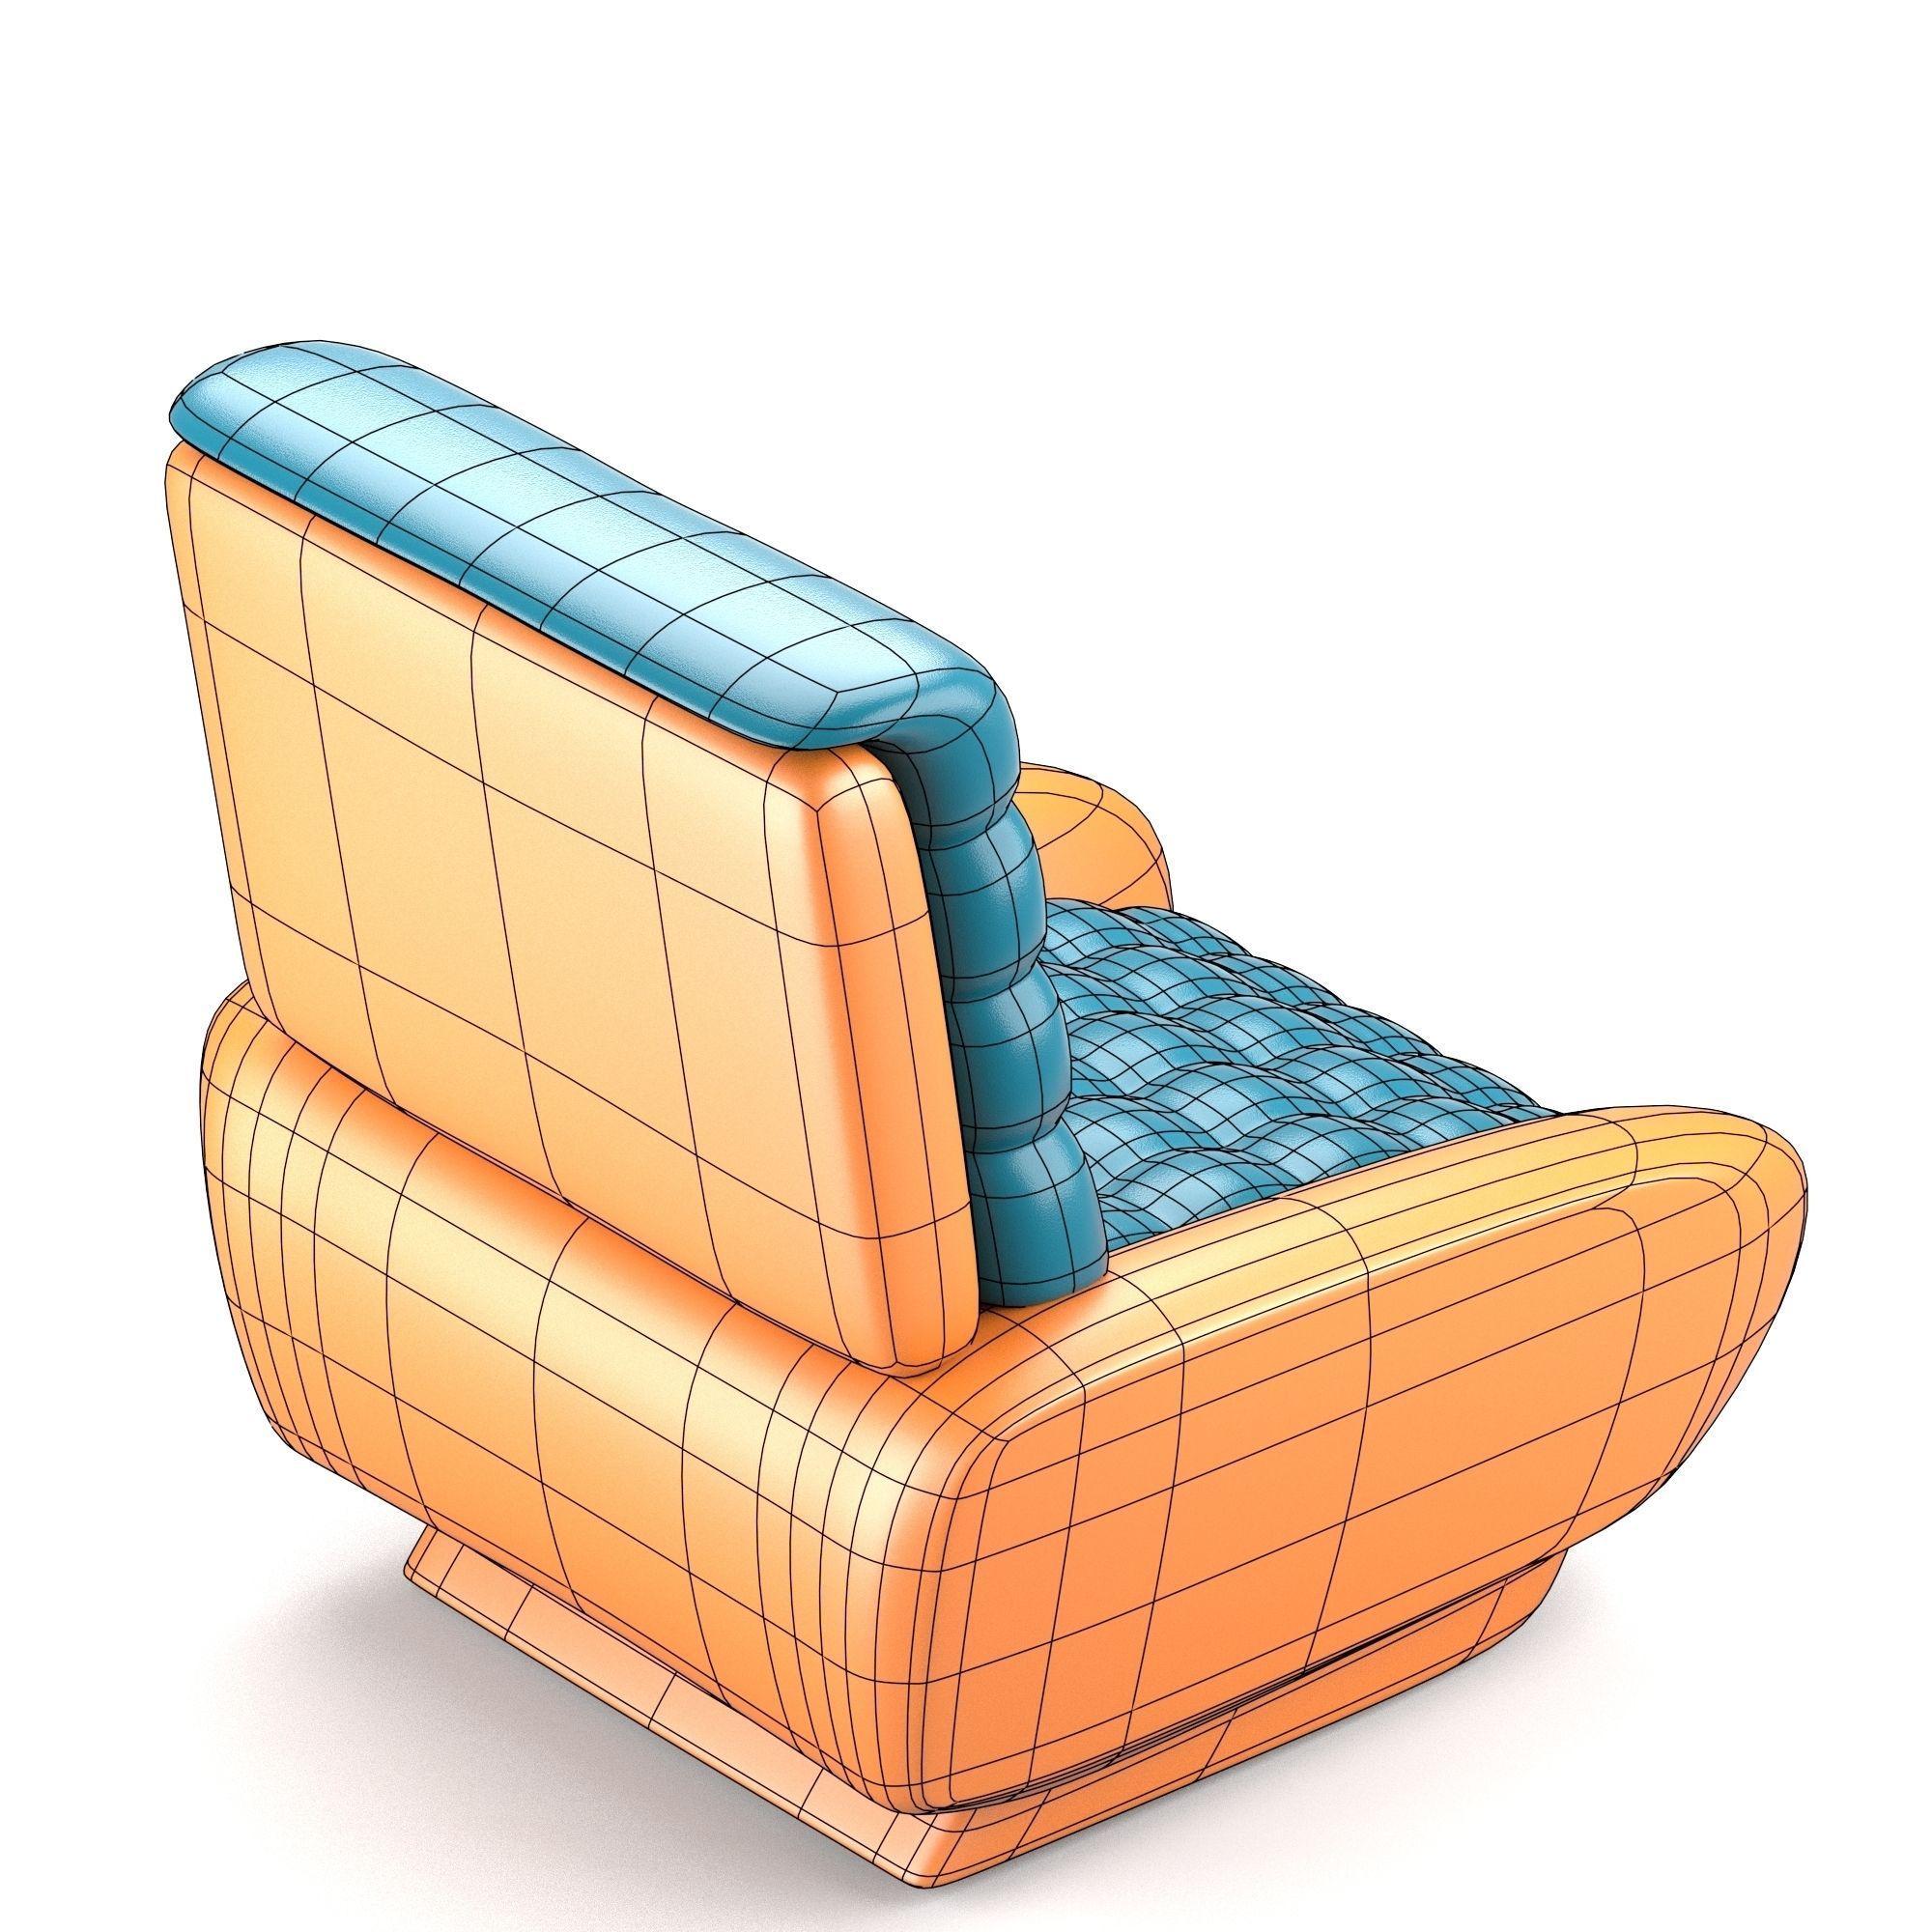 Futuristic design chair 3d model obj fbx stl blend dae for New model chair design